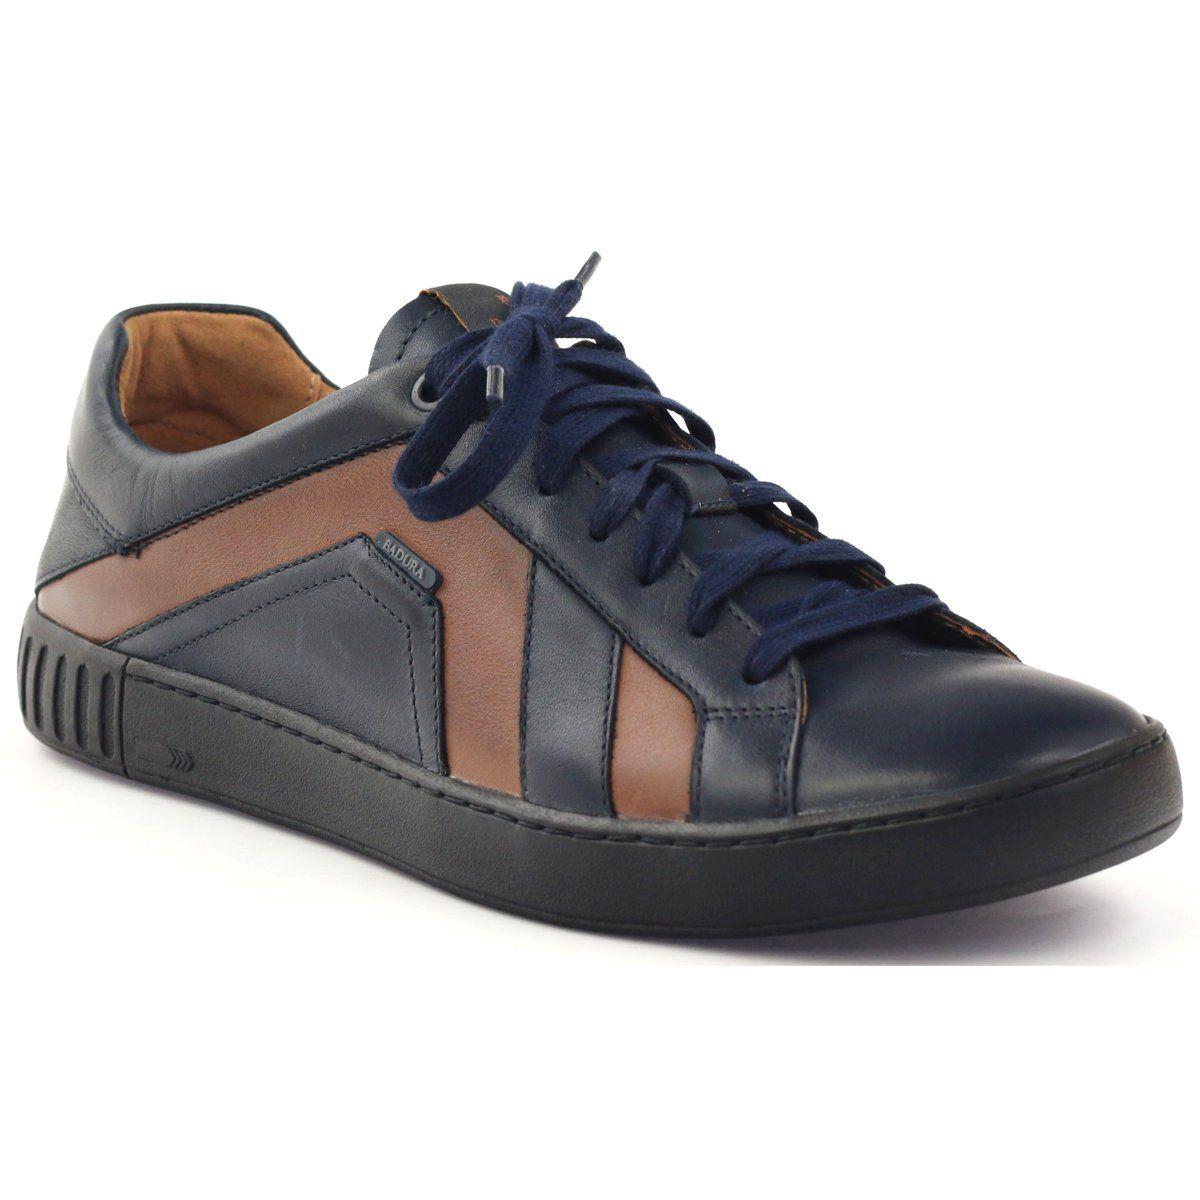 Polbuty Sportowe Badura 3387 Granatowe Brazowe Mens Shoes Boots Shoes Mens Shoes